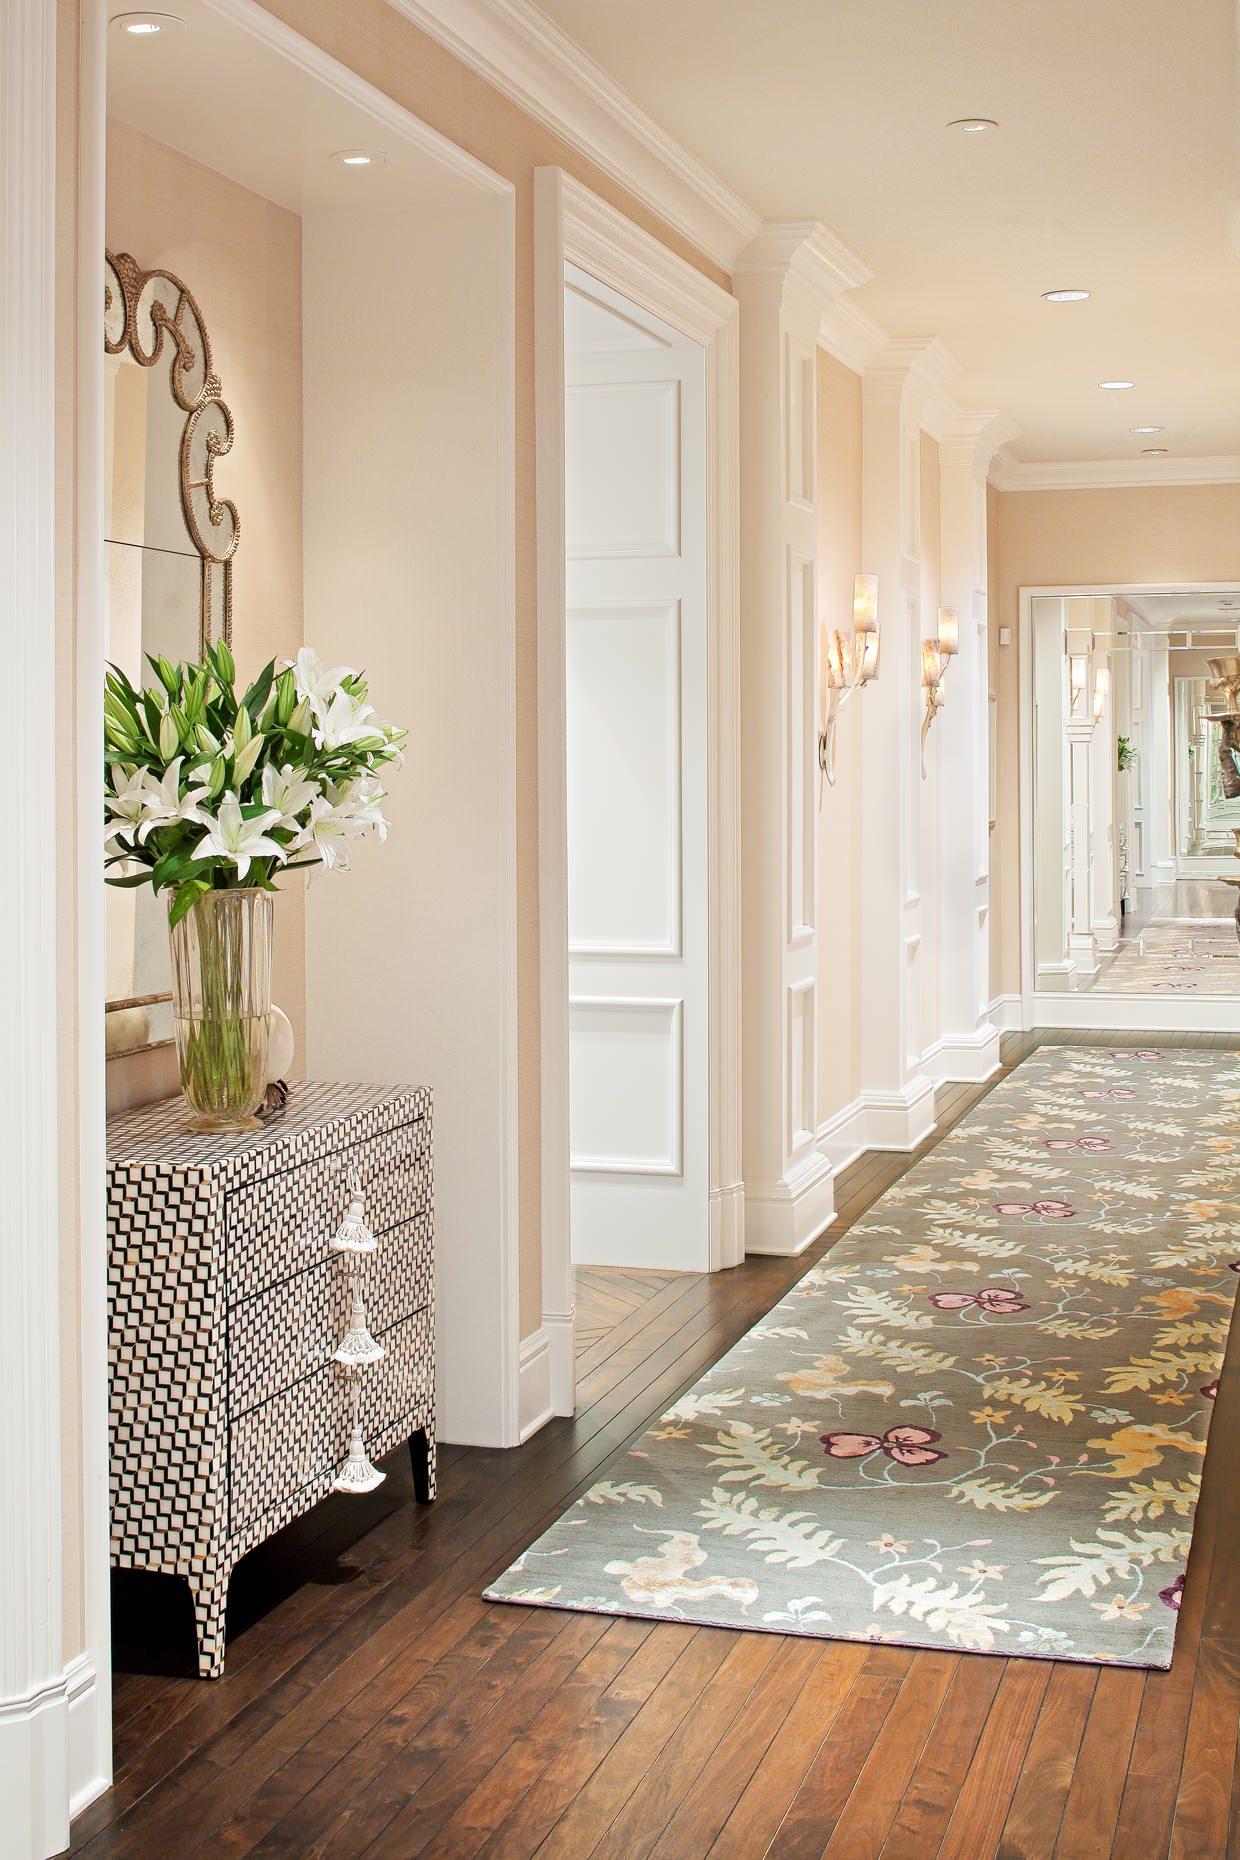 how-to-decorate-narrow-entryway-hallway-entrance-home-cream-peach-moulding-ideas-long-carpet-rug-inspiration-pot-lights-barn-floor-